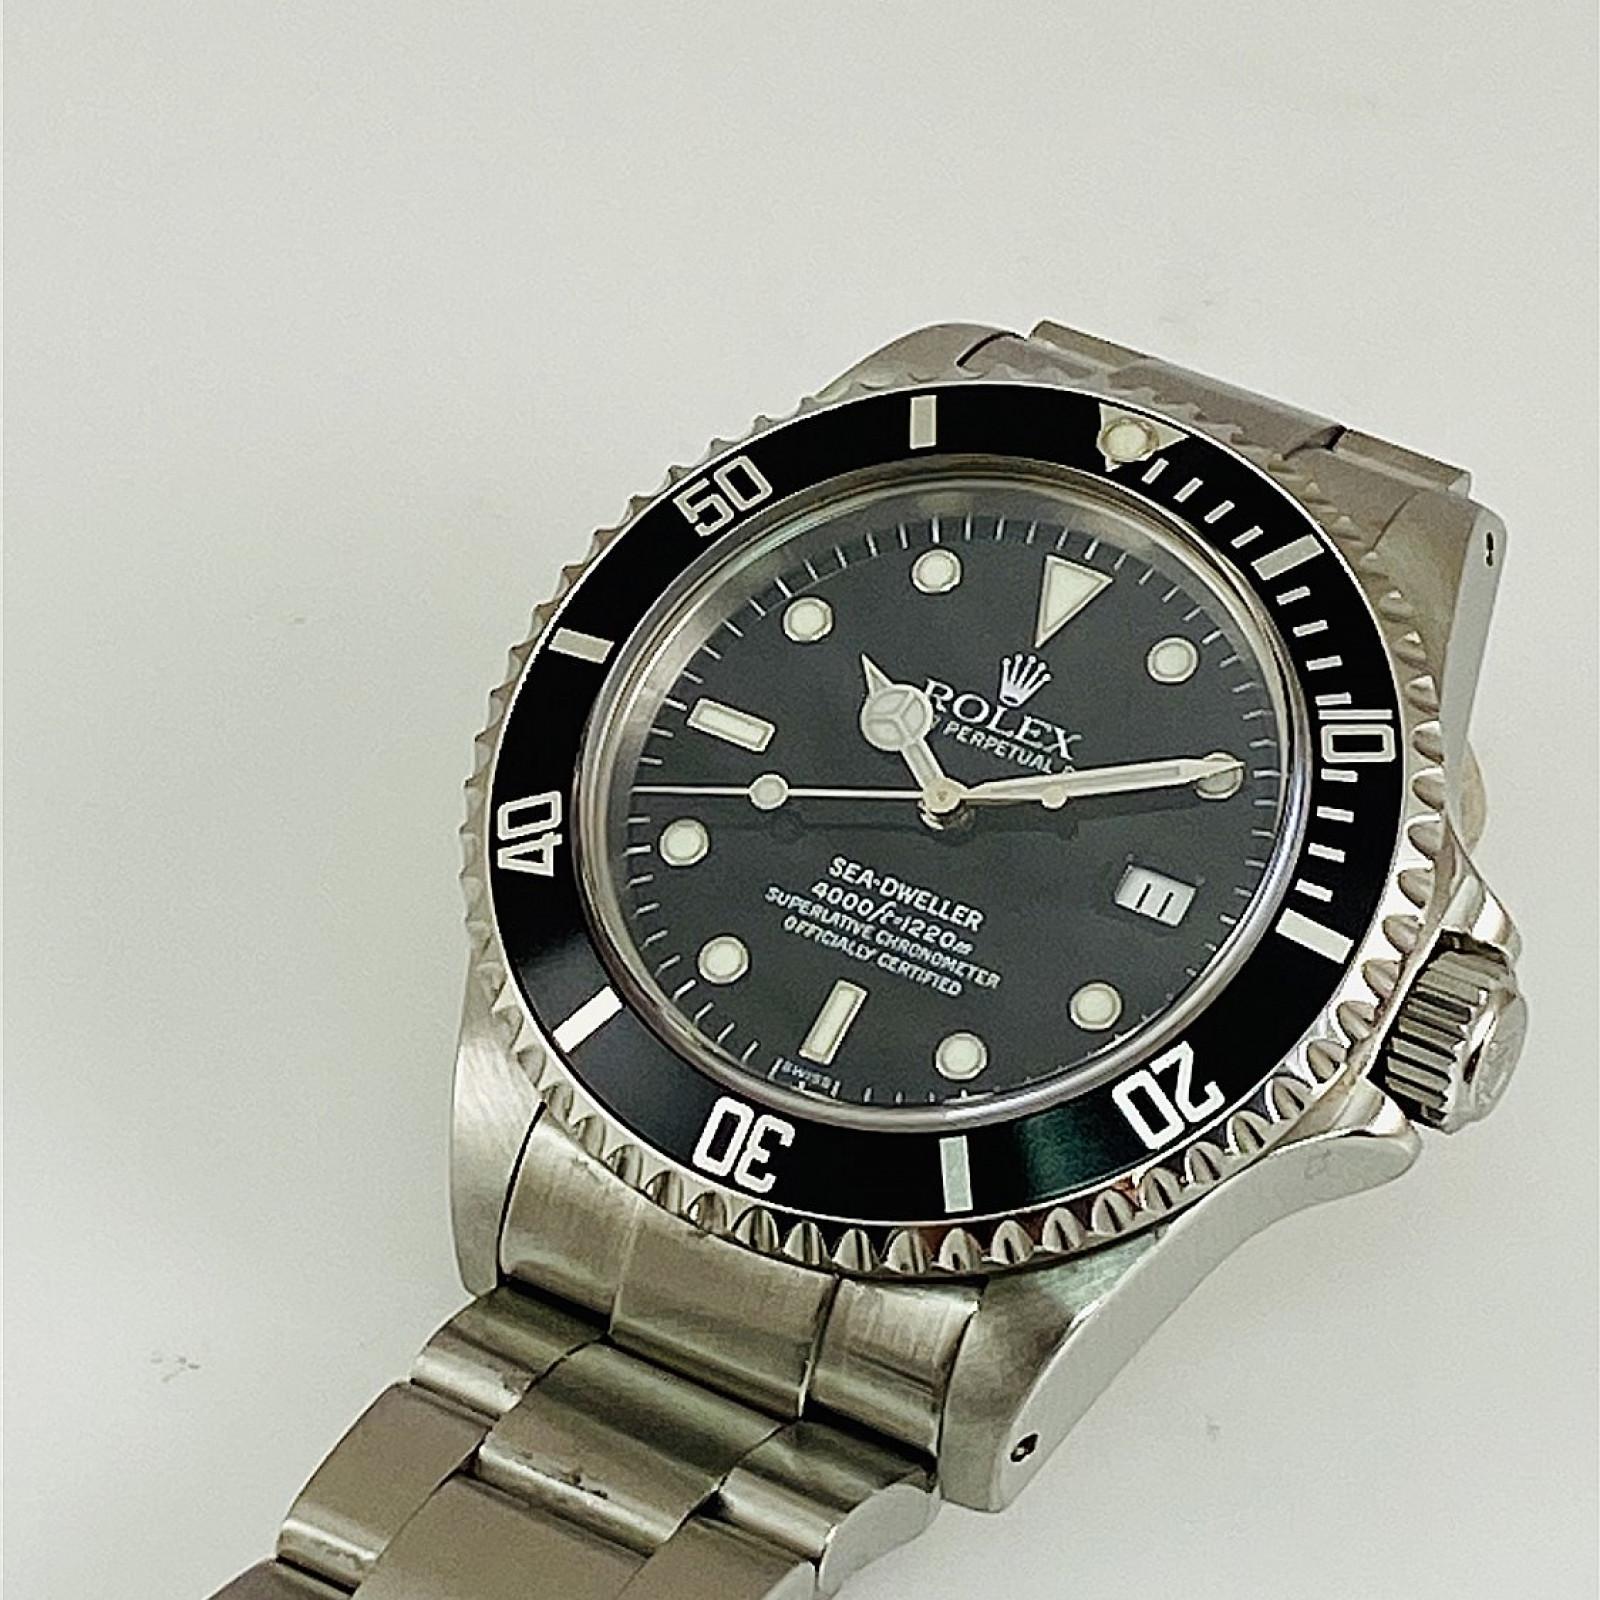 1999 Rolex Sea-Dweller Ref. 16600 Single